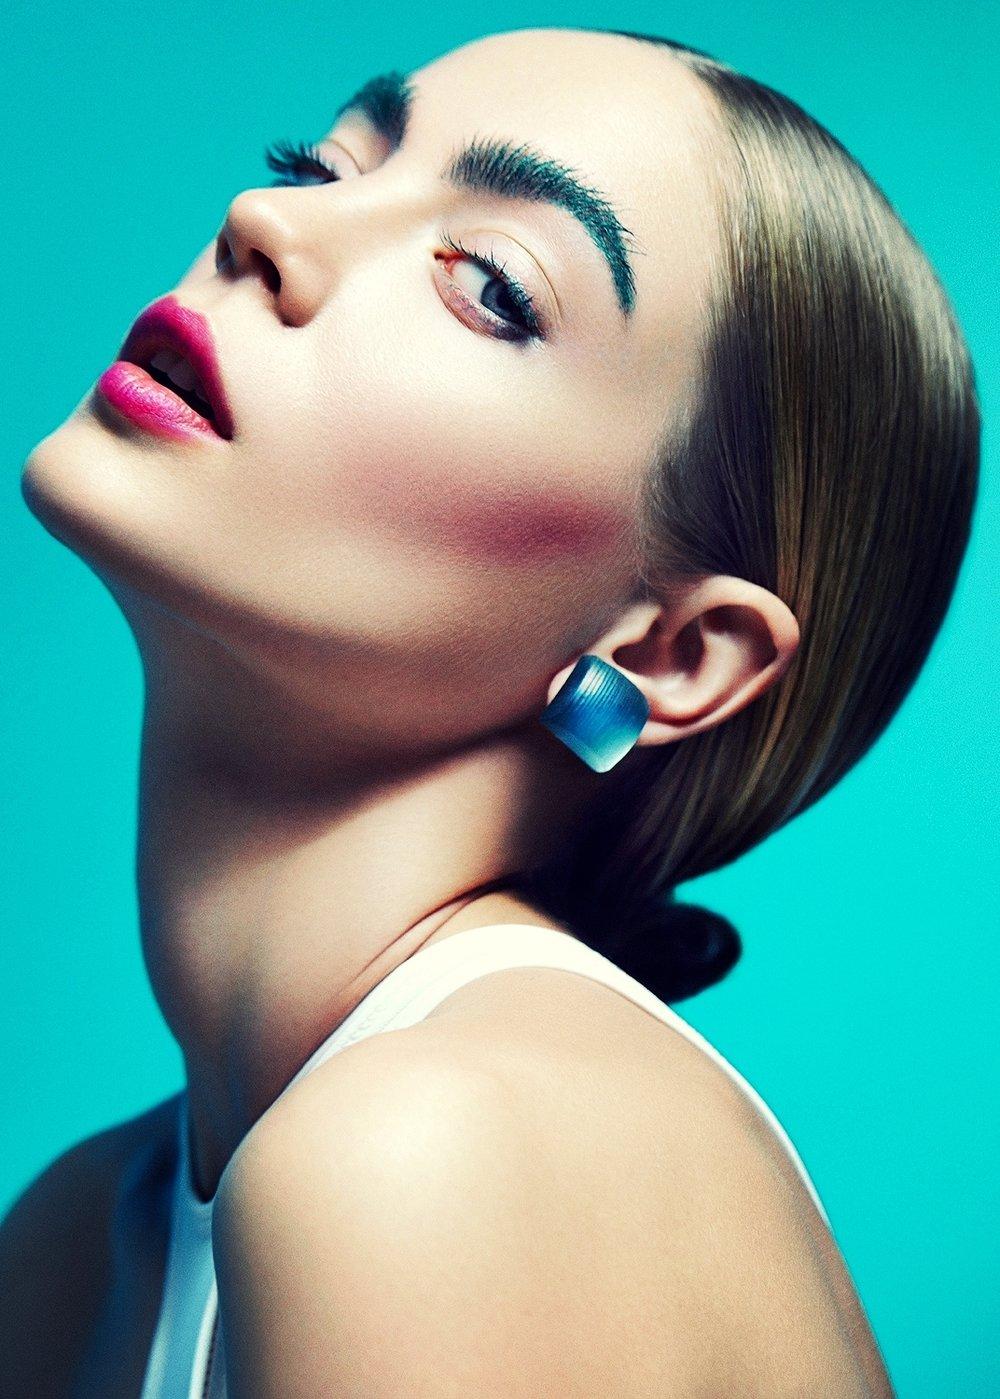 CREEM Magazine-Tortured Beauty